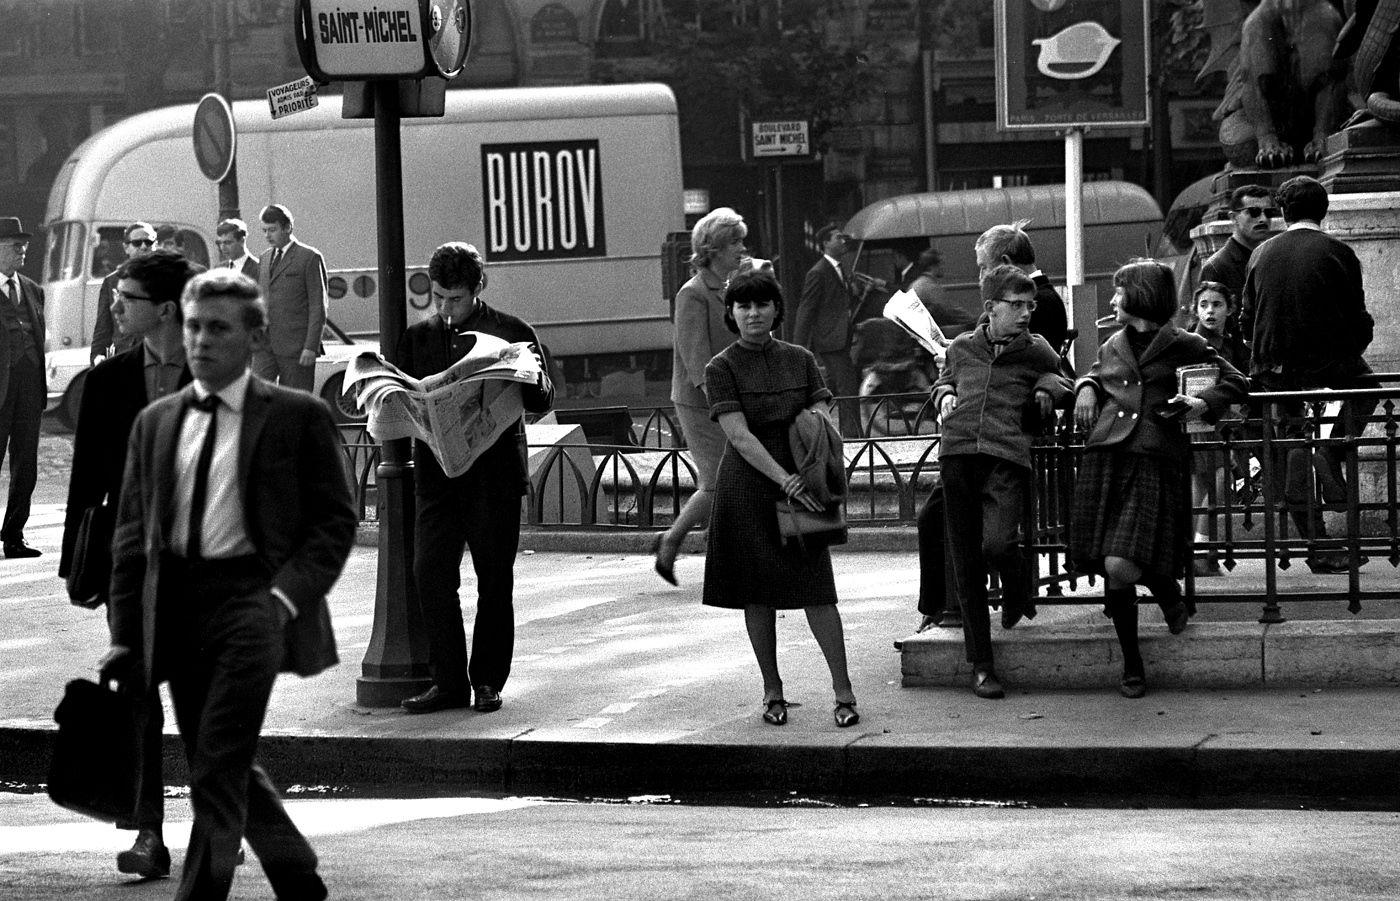 Image Result For Paris 1960s With Images Paris Champs Elysees